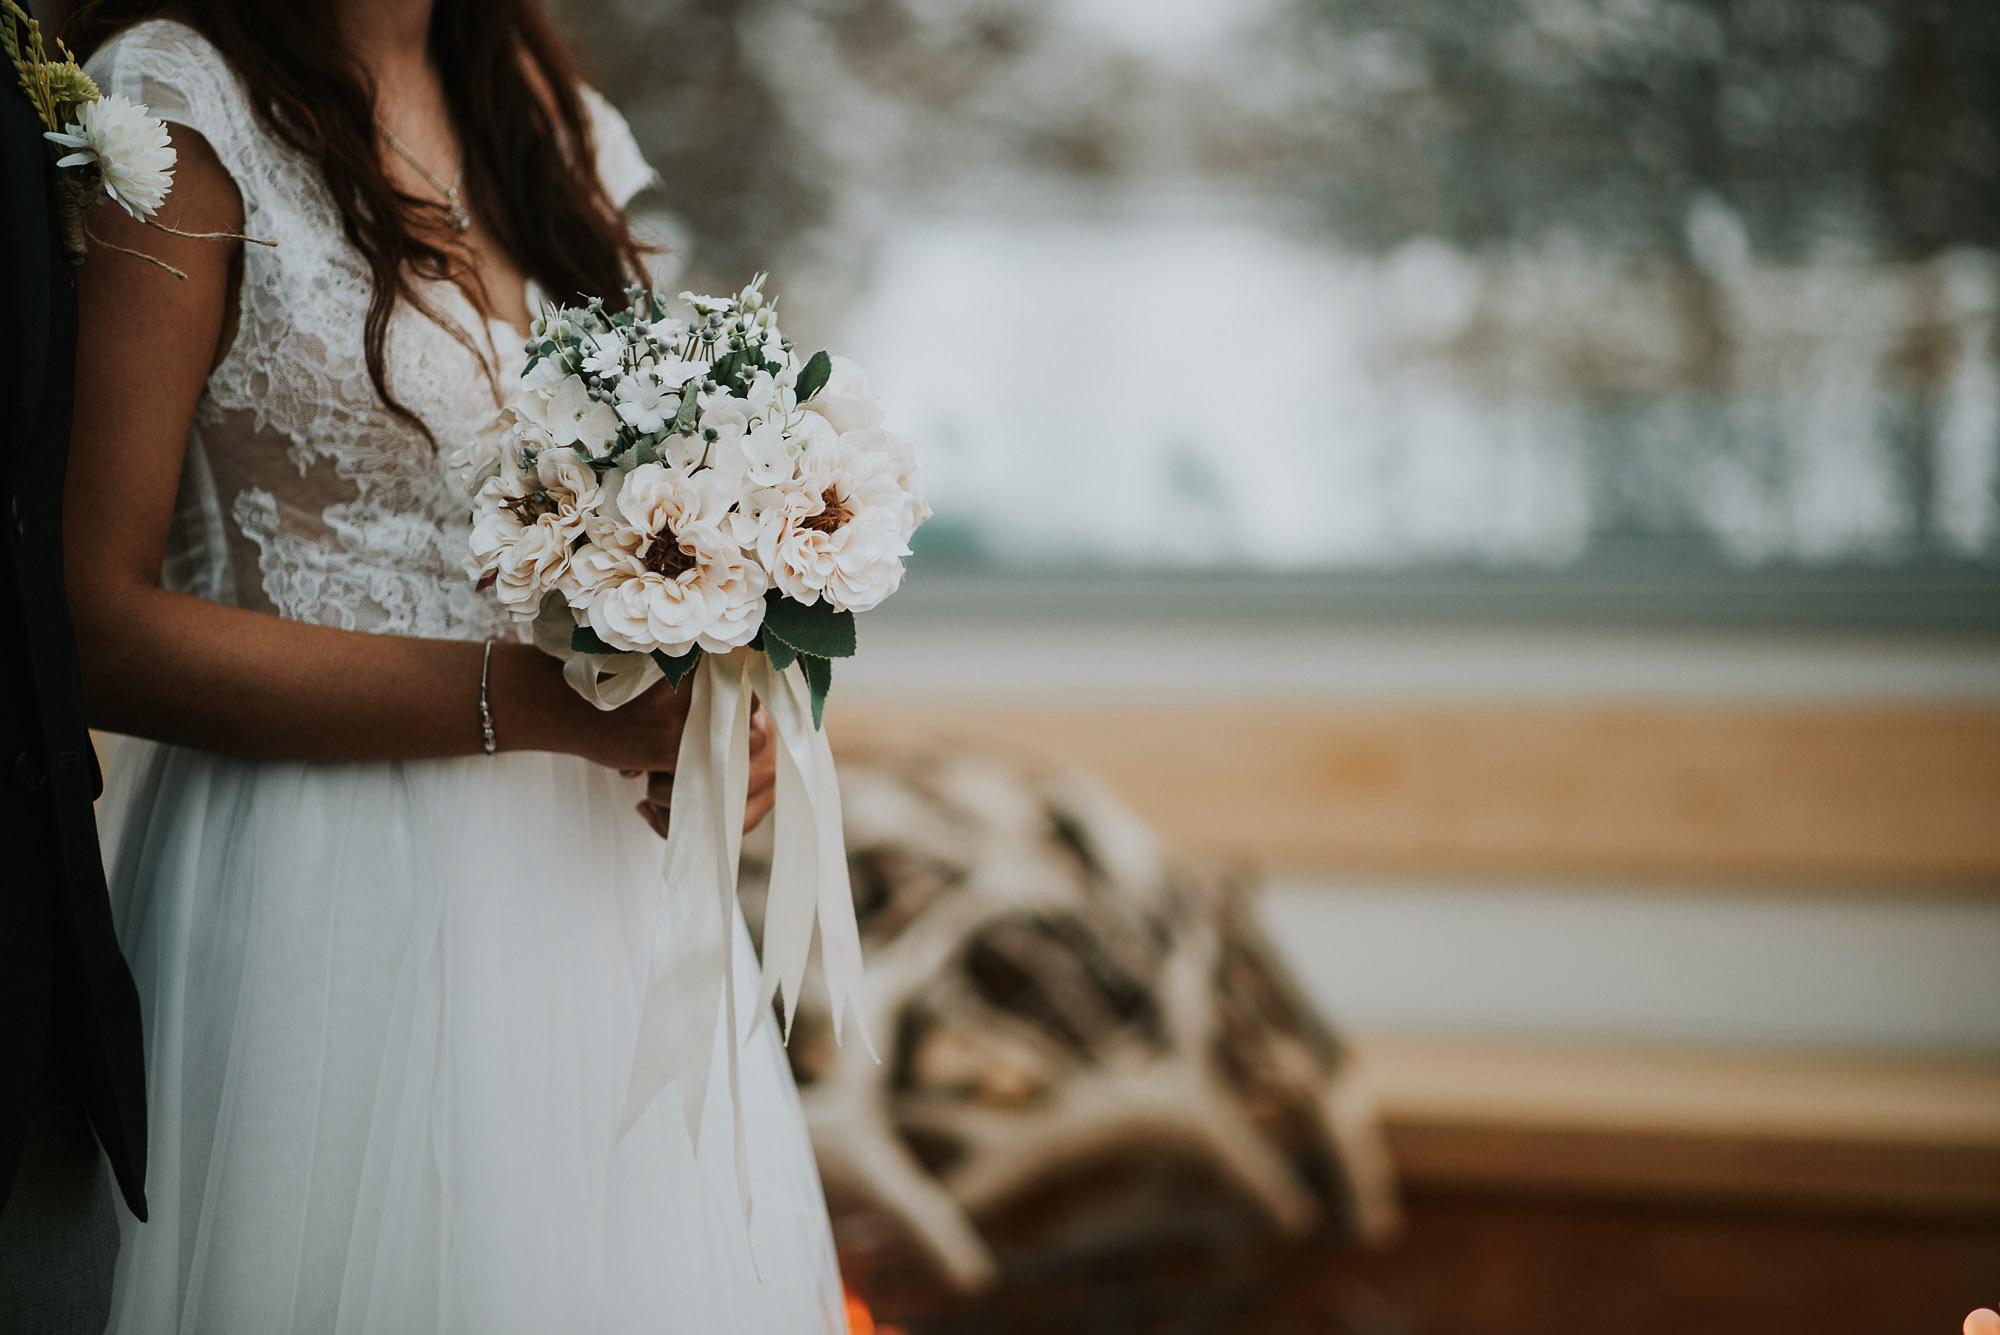 levi-ice-chapel-weddings-lapland-finland-photographer-jere-satamo-014-blog.jpg